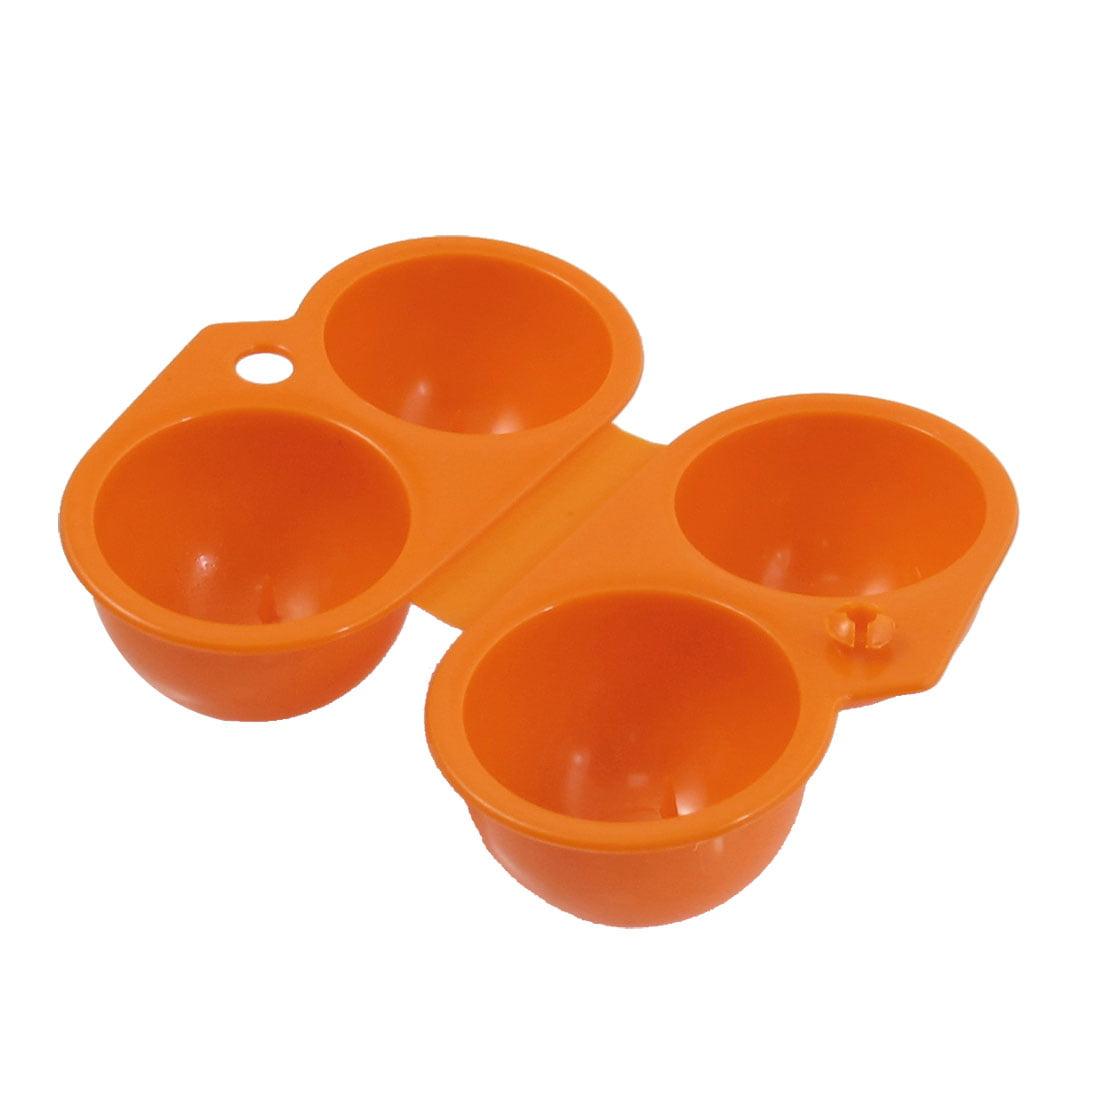 Travel Outdoor Folding Plastic 4 Egg Case Keeper Holder Carrier Orange